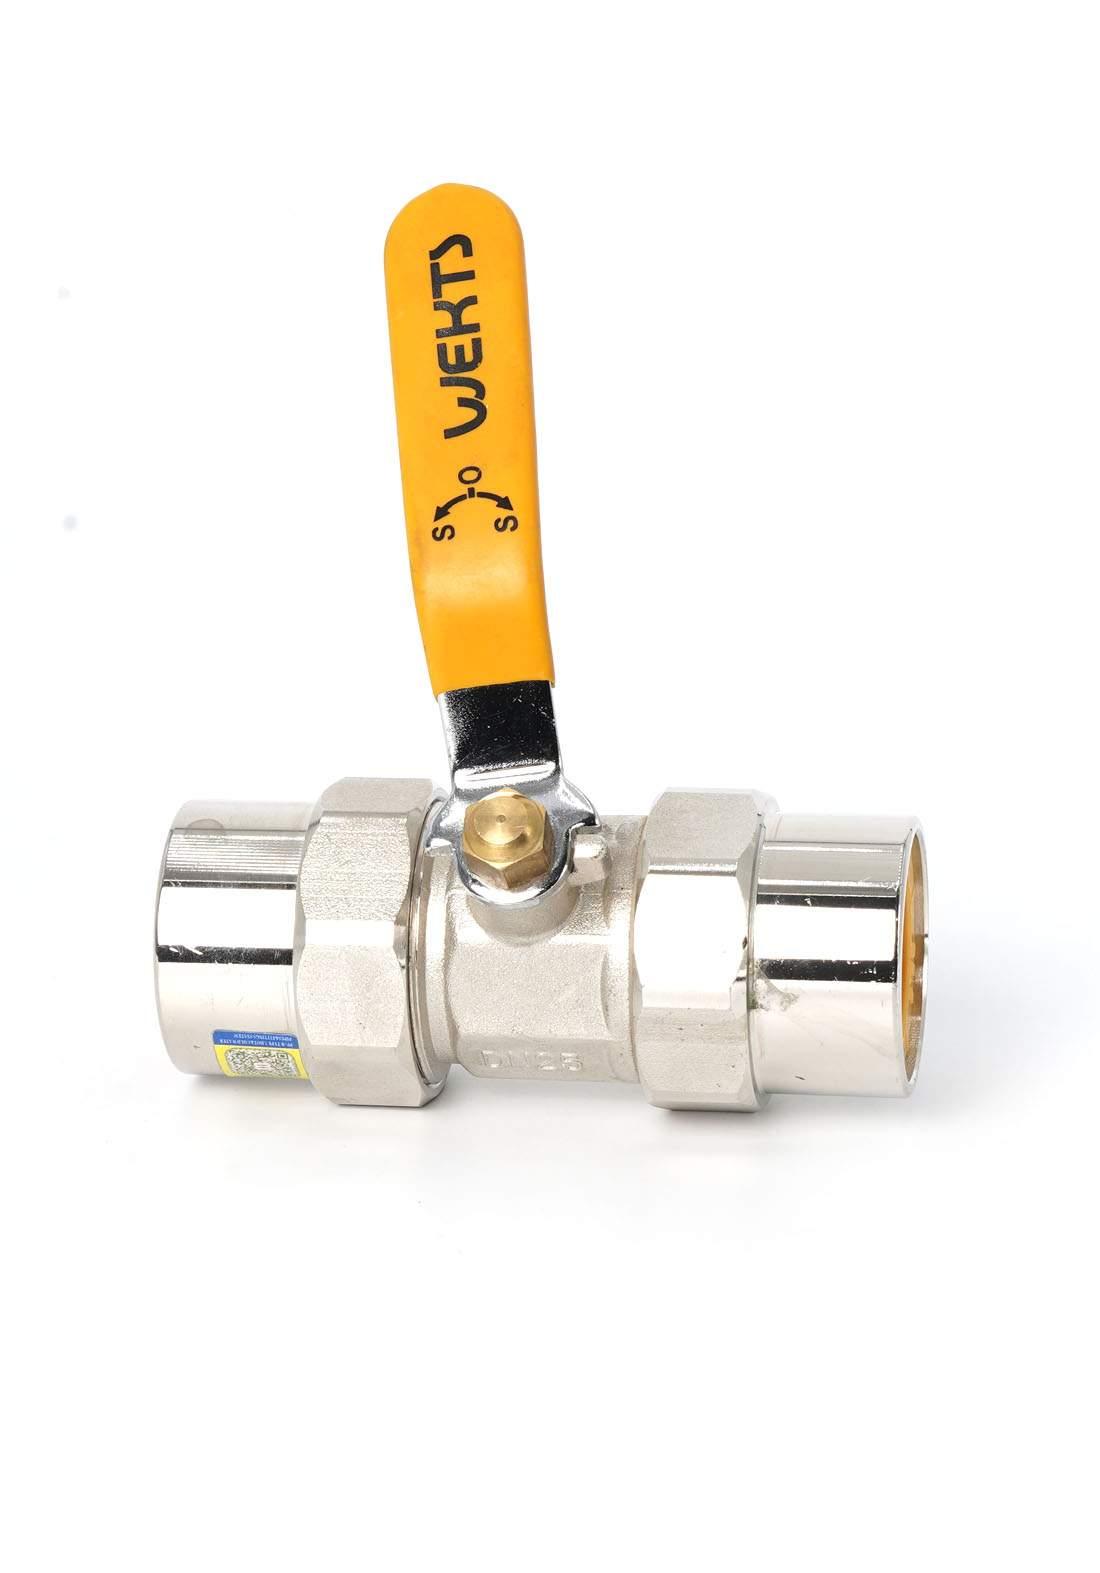 Wekts 5124 Double Chrome Flat Lock 32 mm قفل انابيب مزدوج مسطح لأنابيب المياه